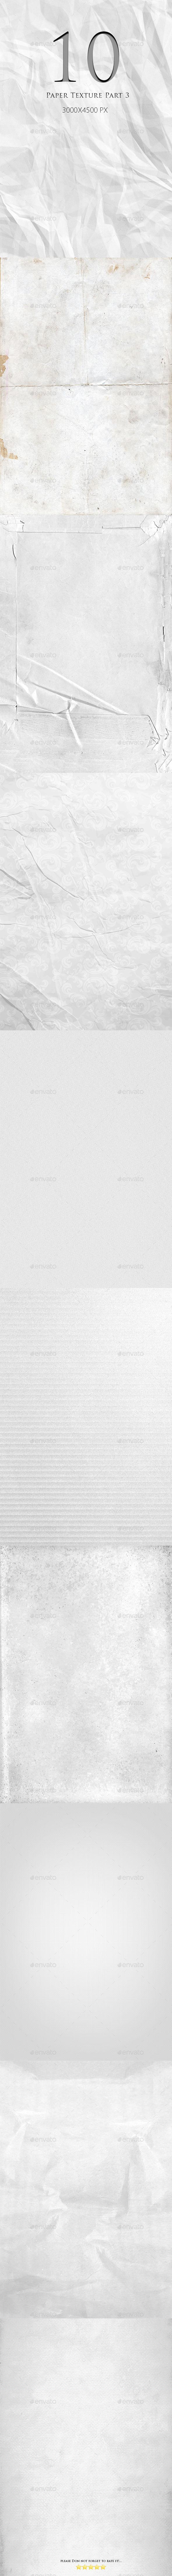 10 Paper Texture Part 3 - Wood Textures